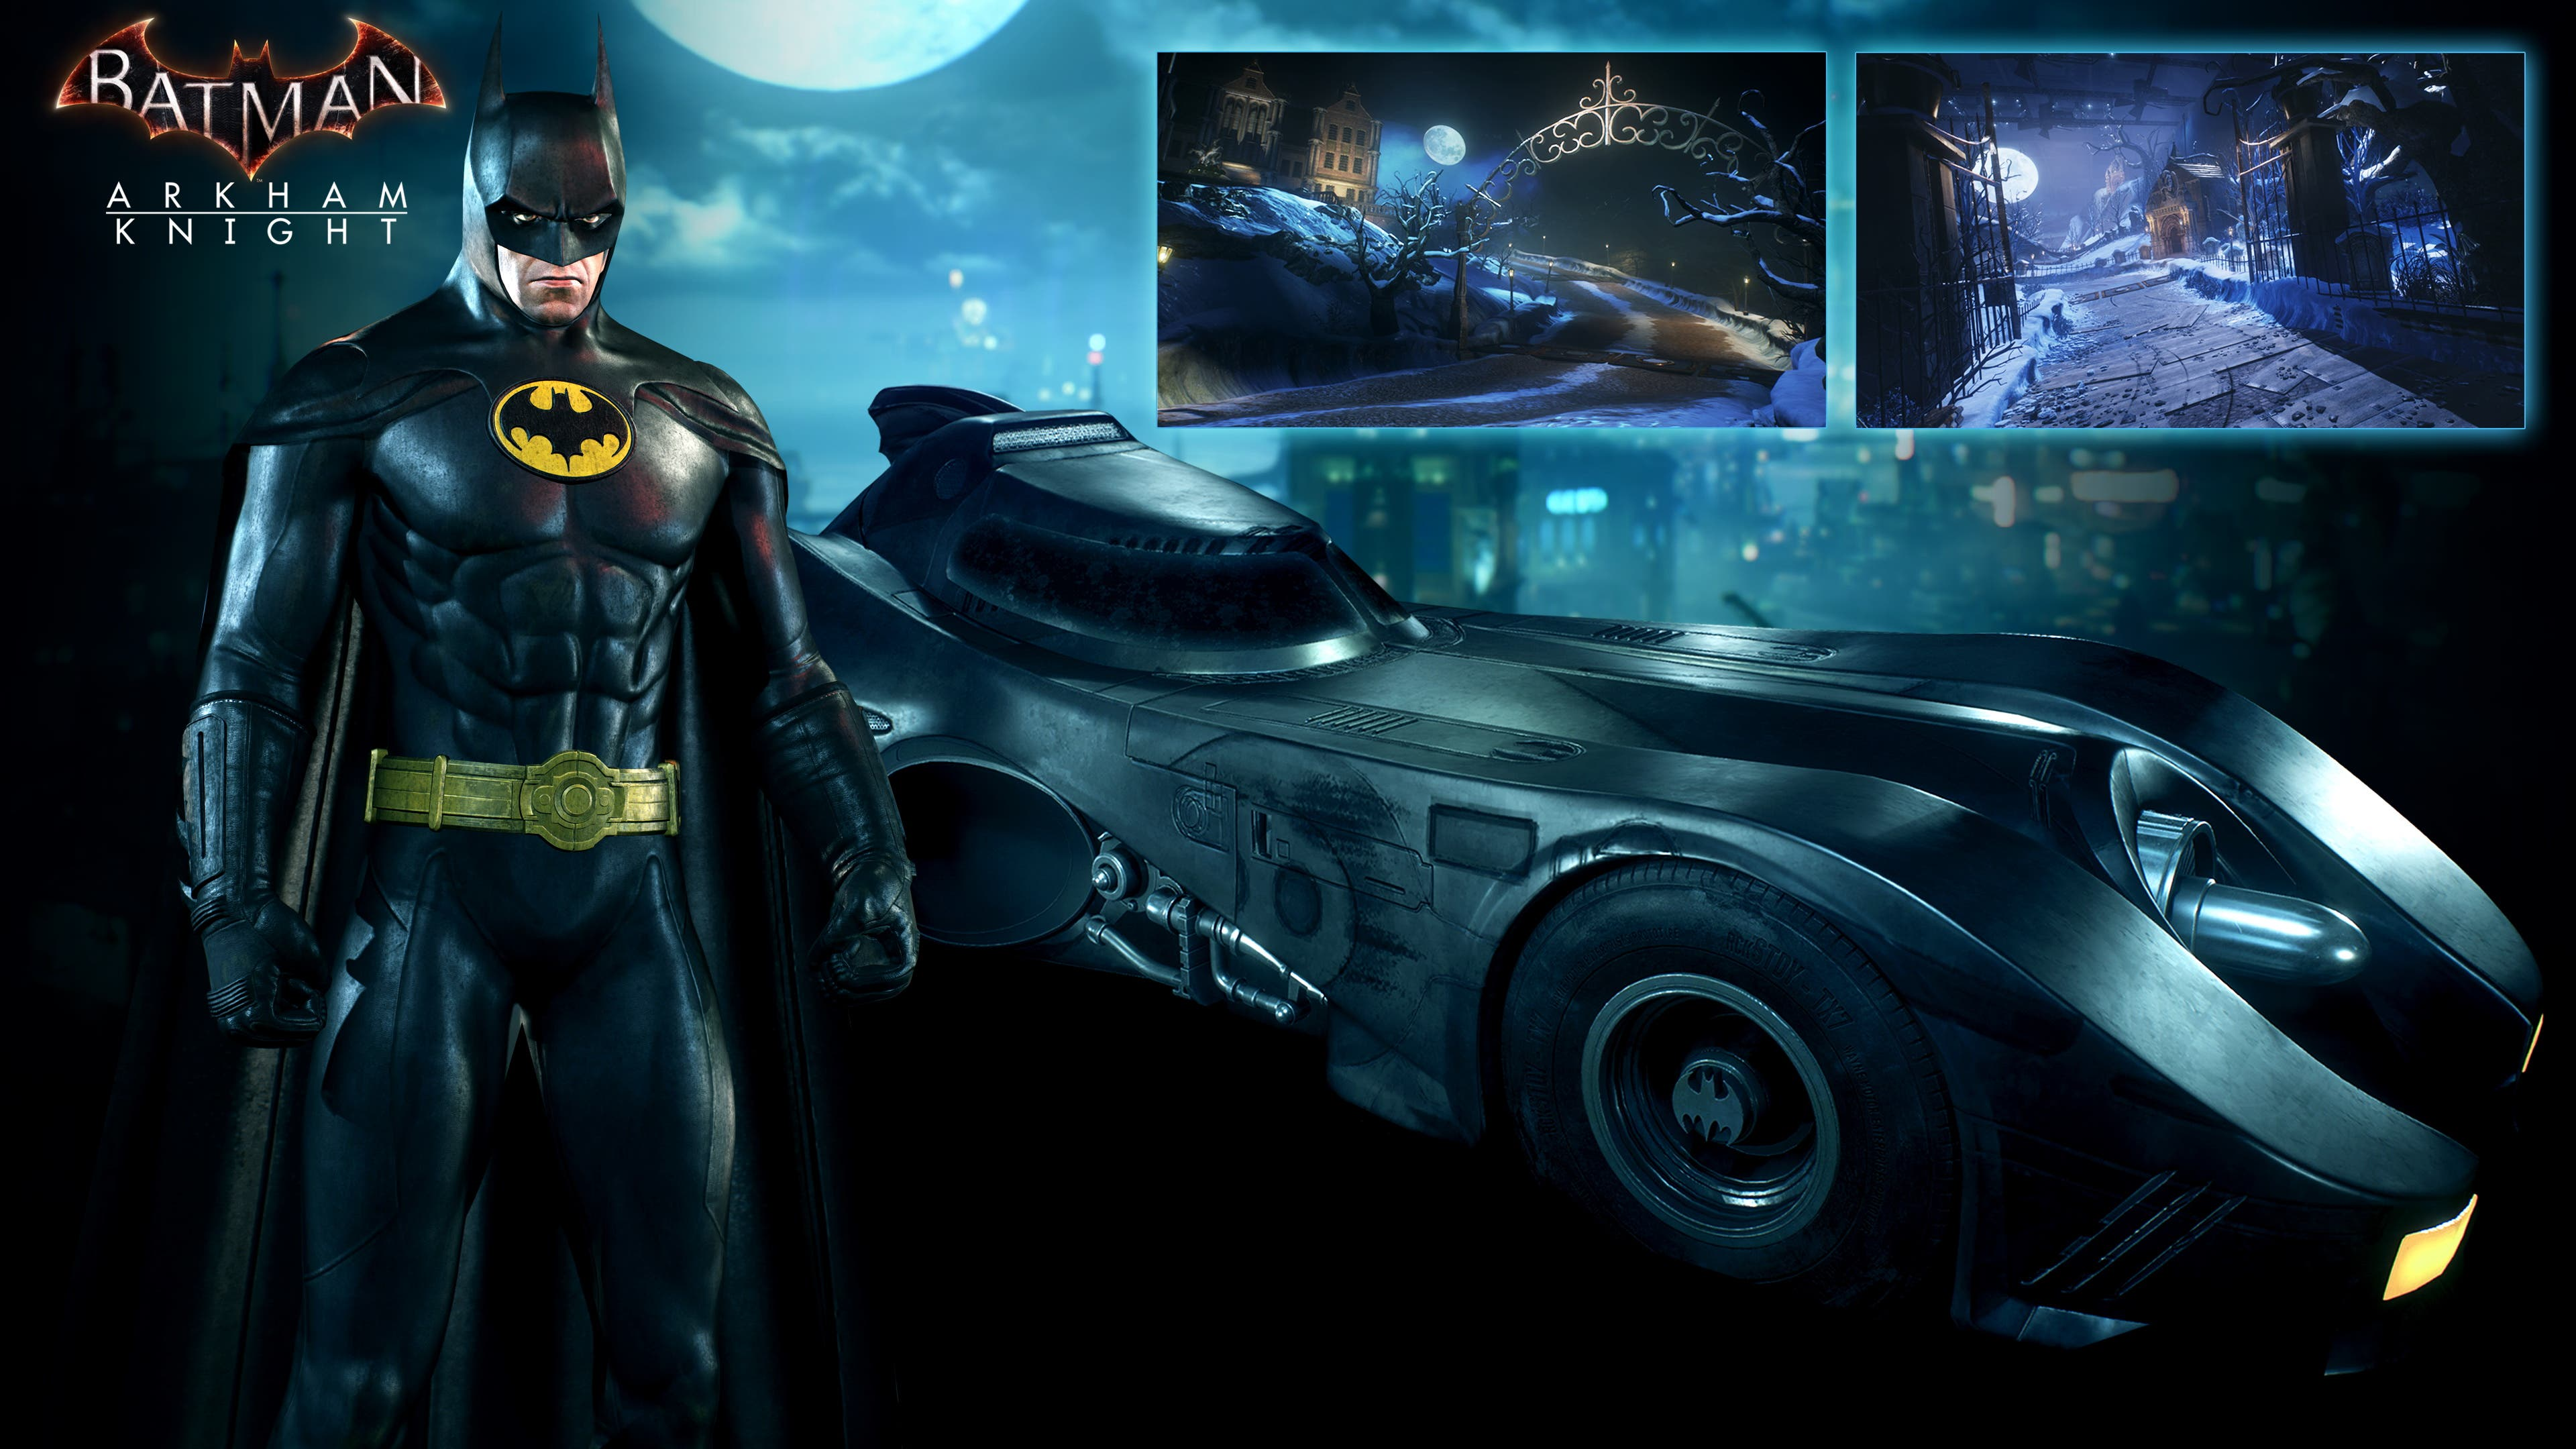 Batman1989 featured